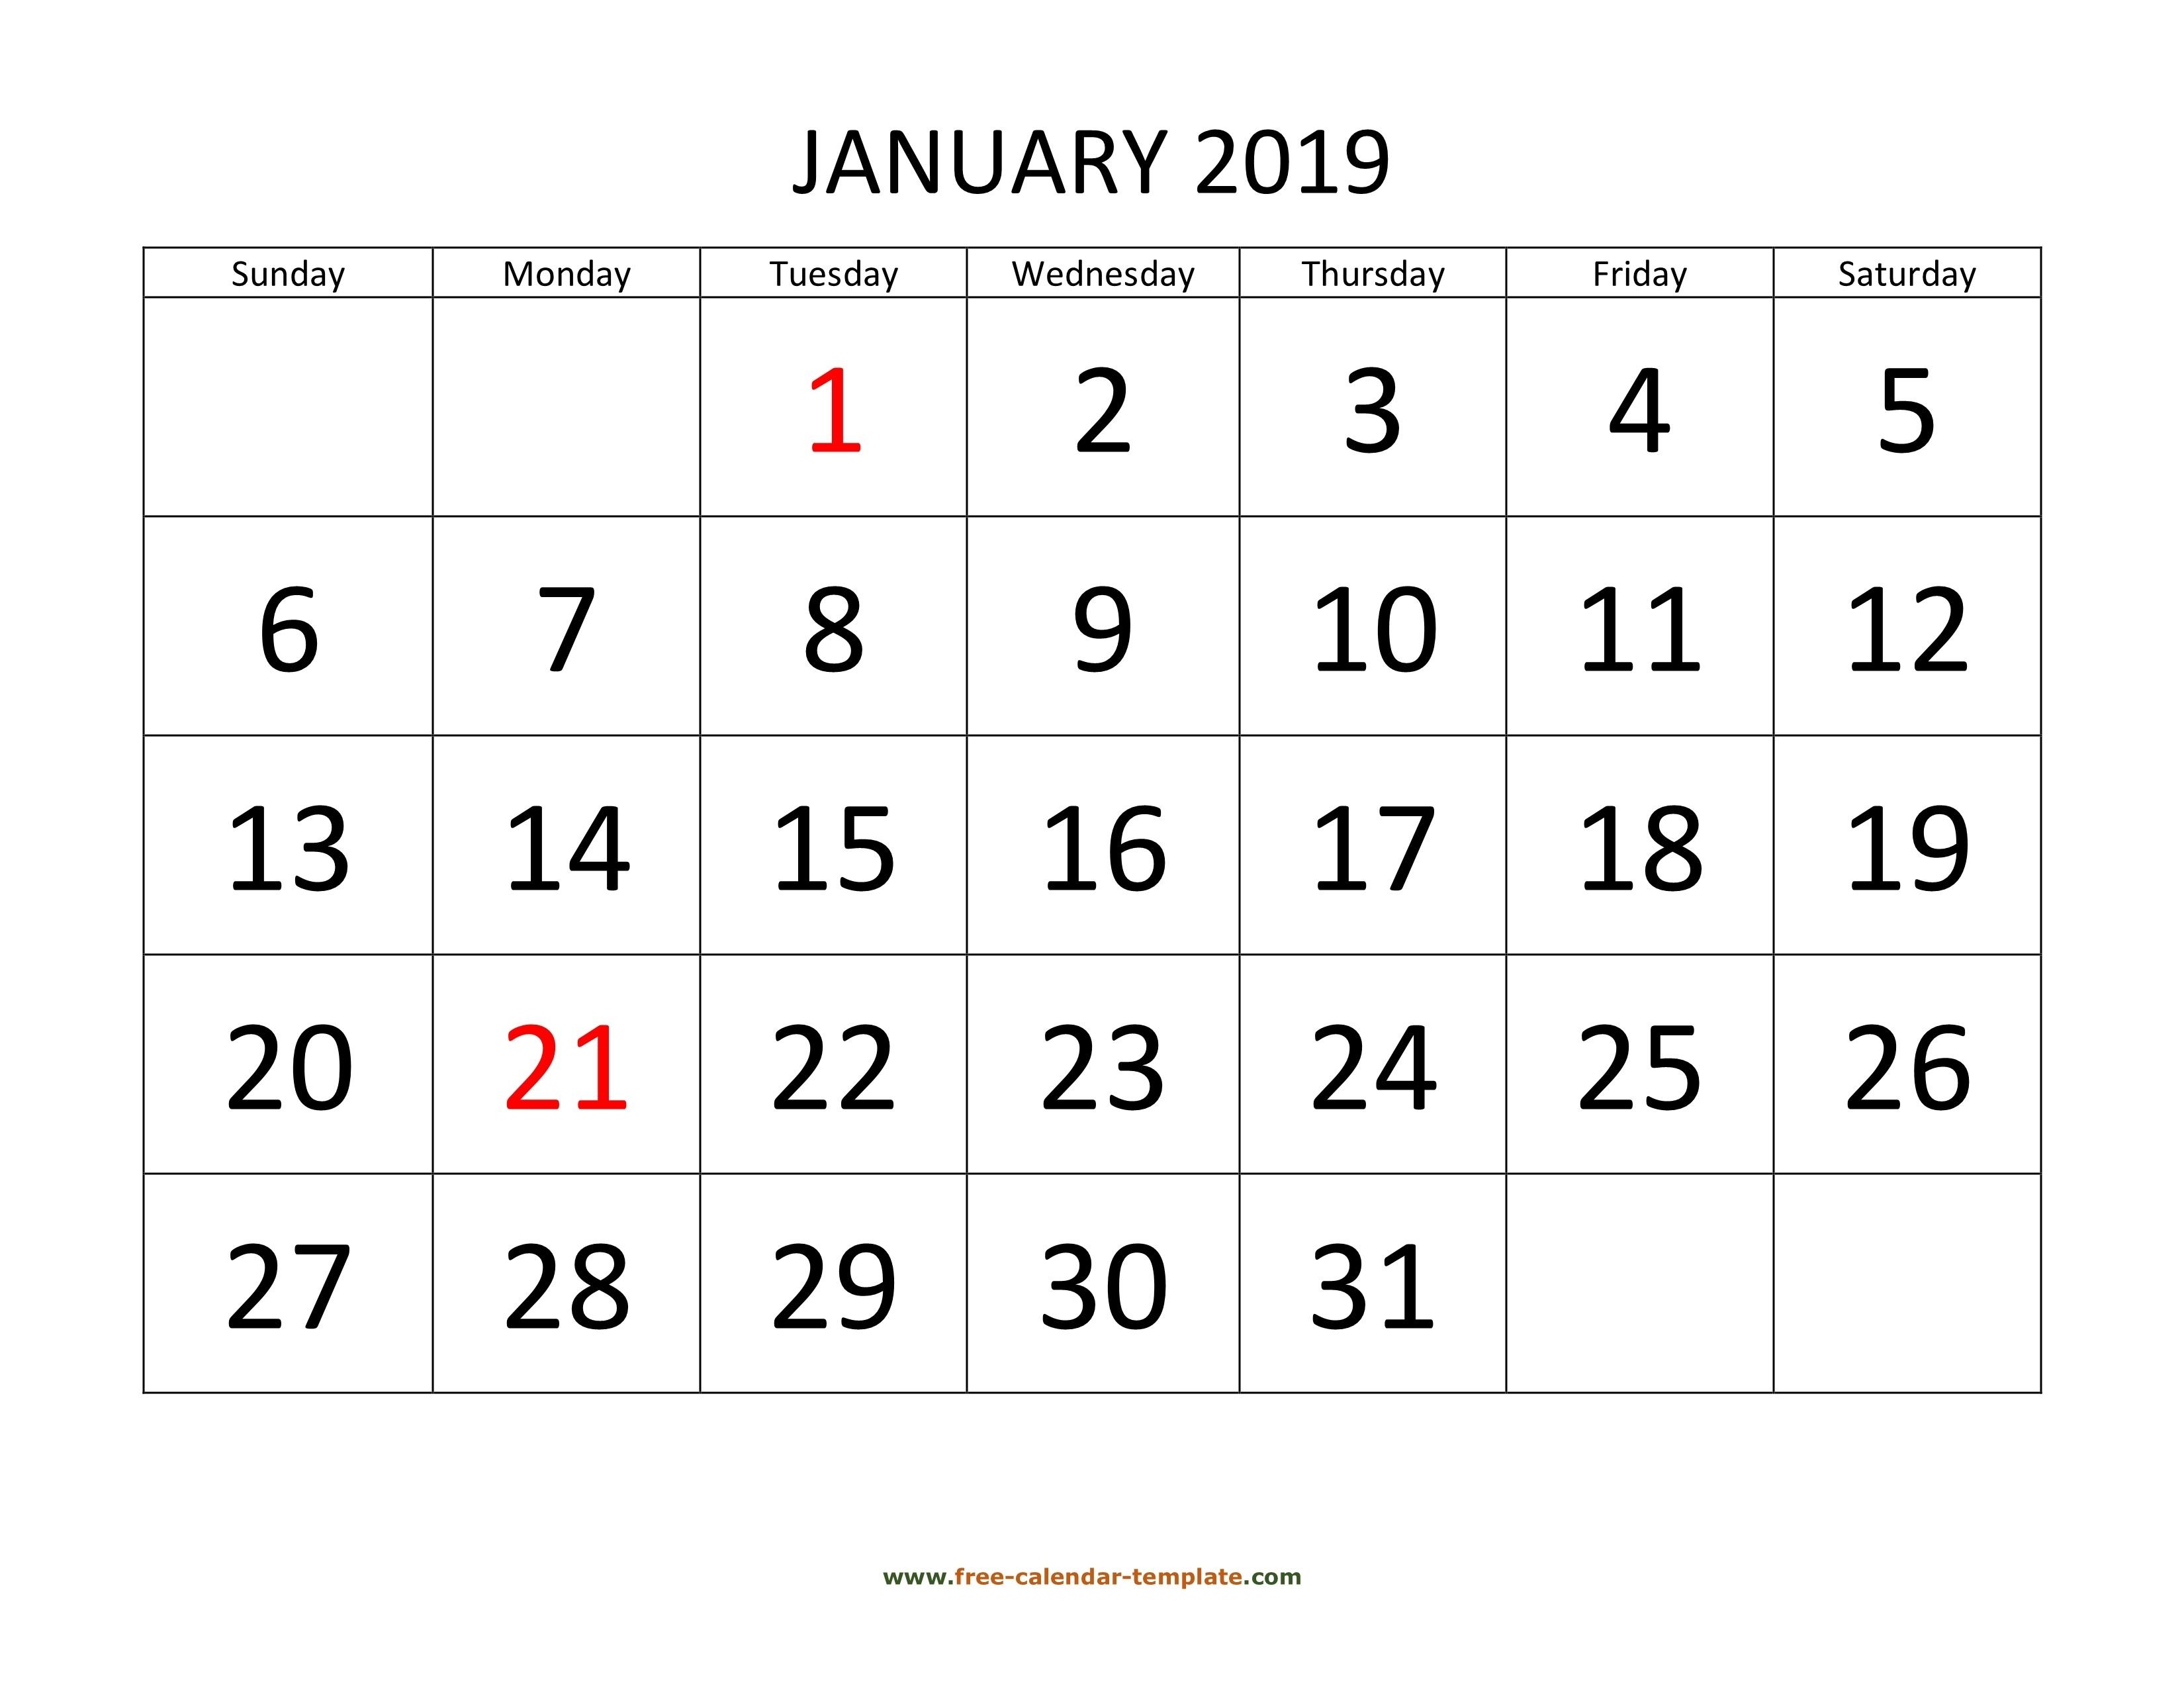 Printable Monthly Calendar 2019 | Free-Calendar-Template_Large Blank Calendar Grid